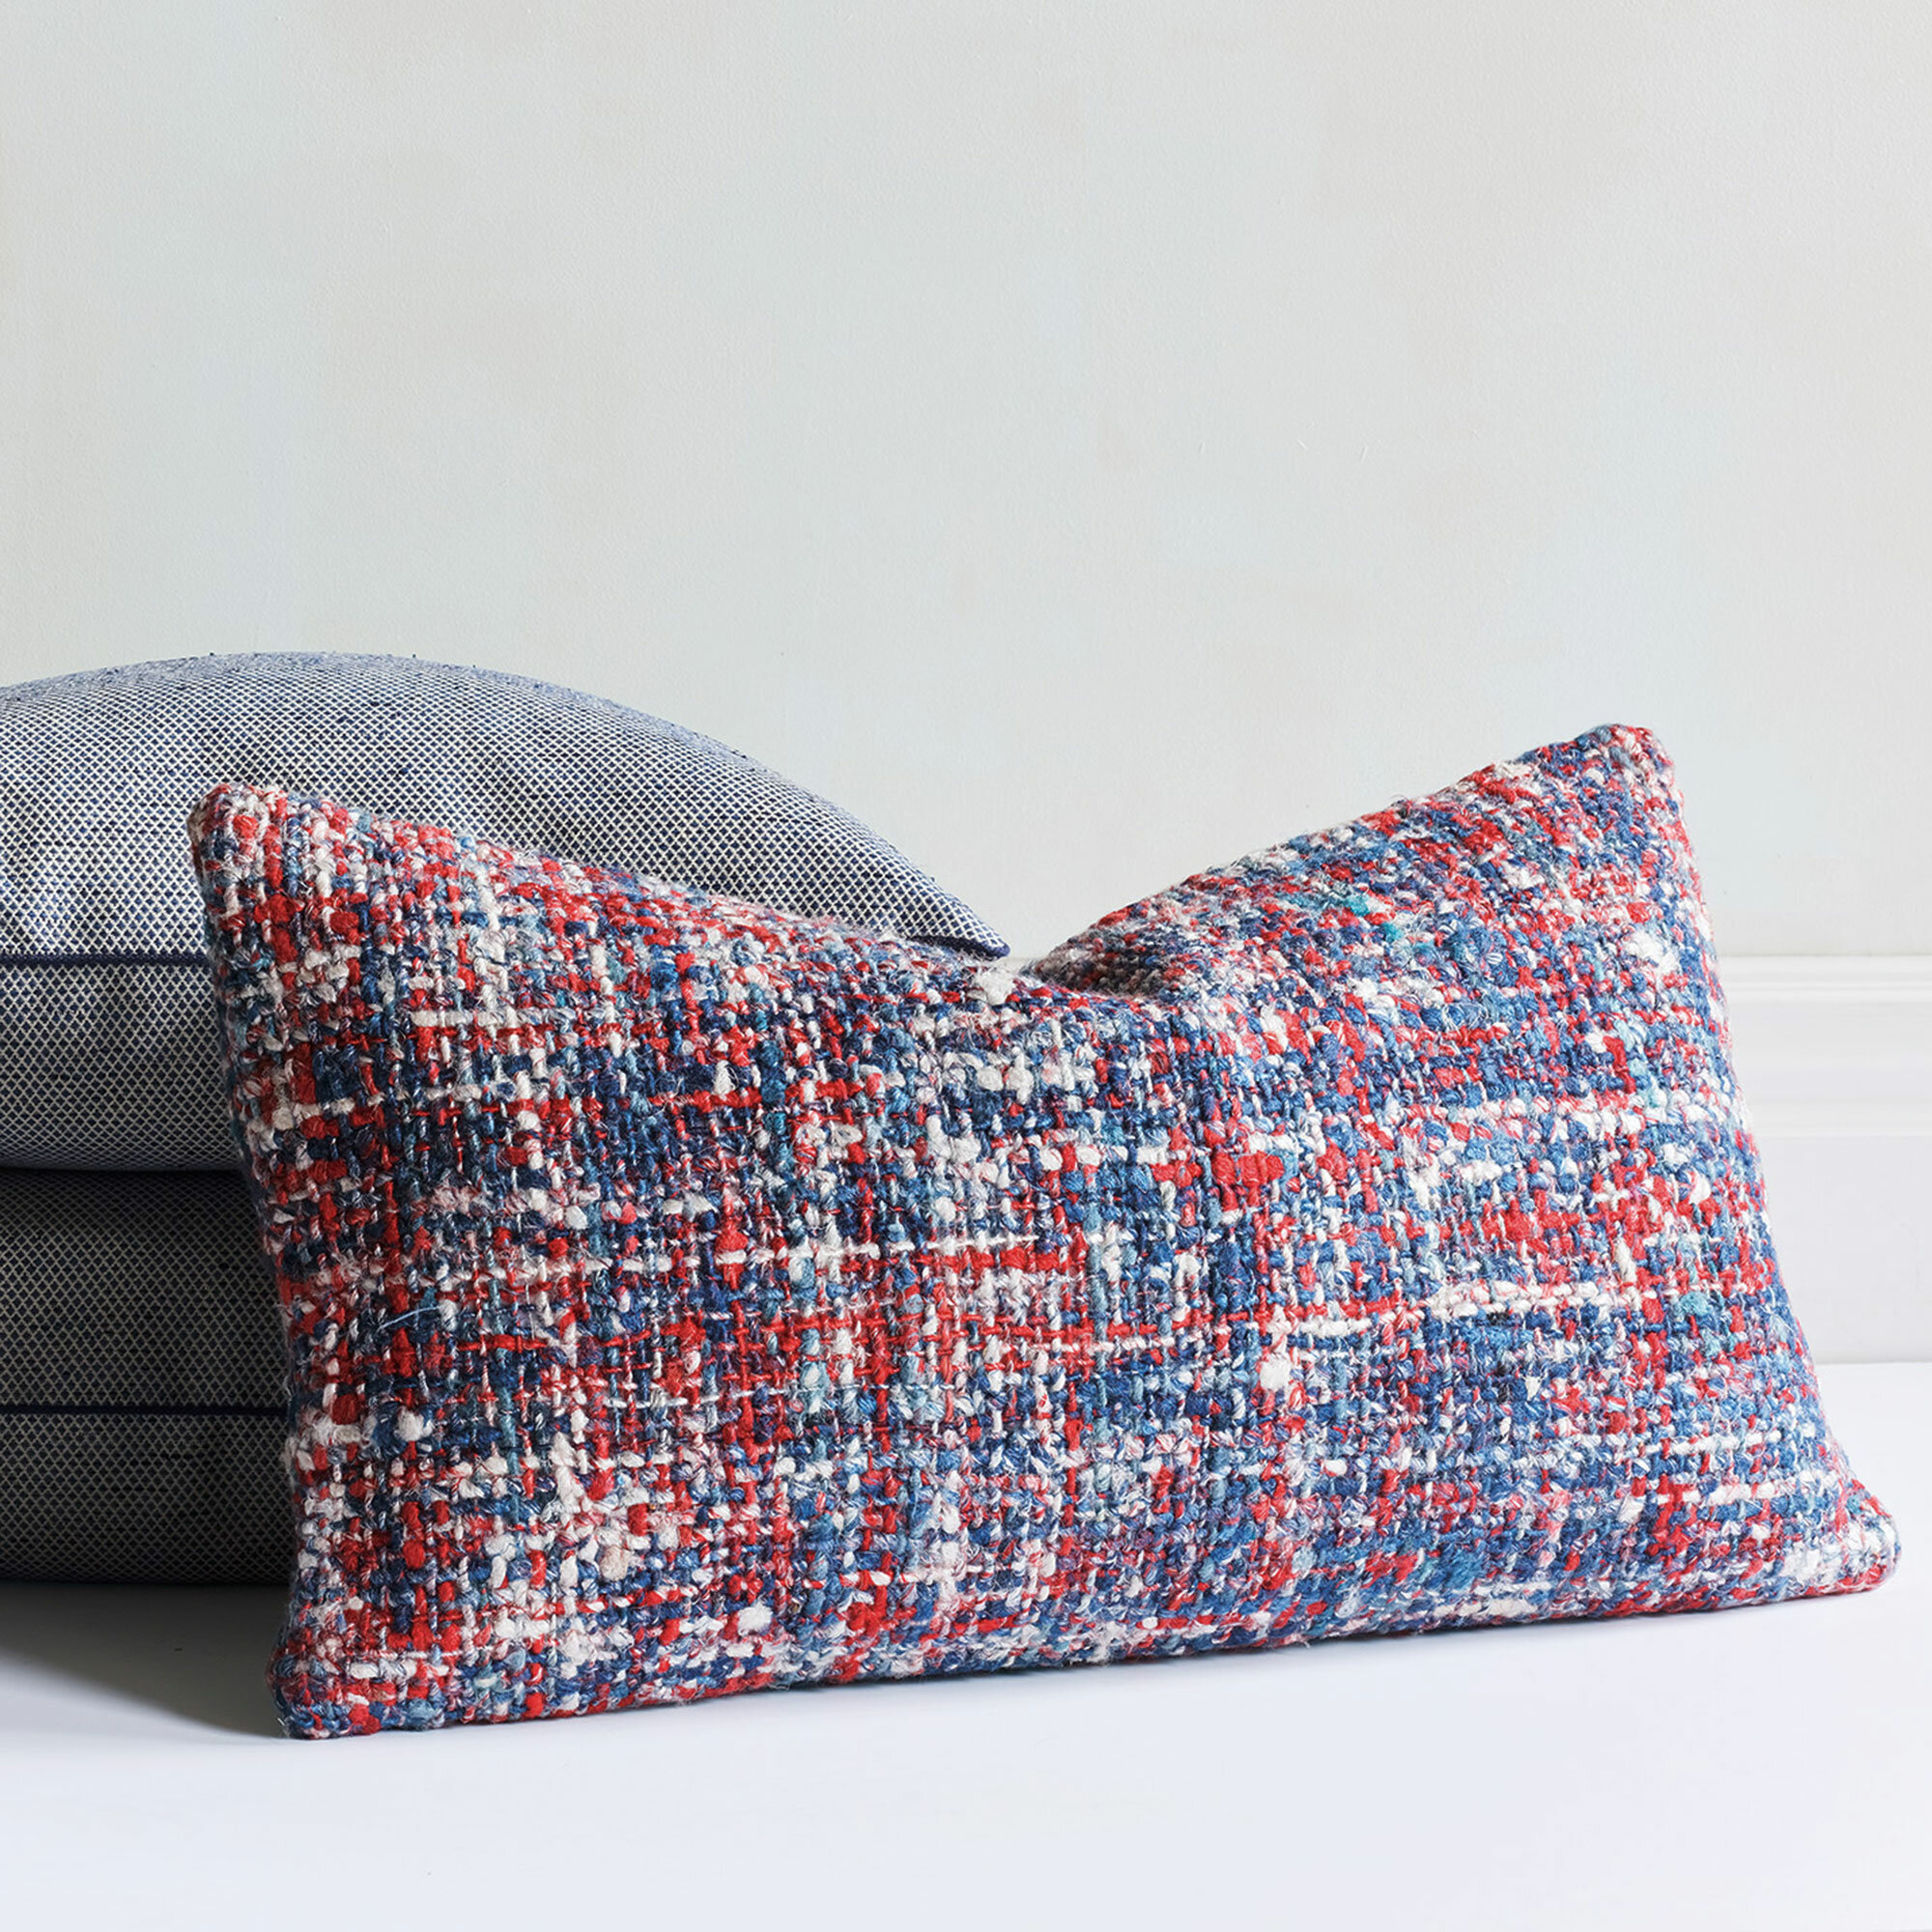 Eastern Accents Barclay Butera Textured Throw Pillow Wayfair